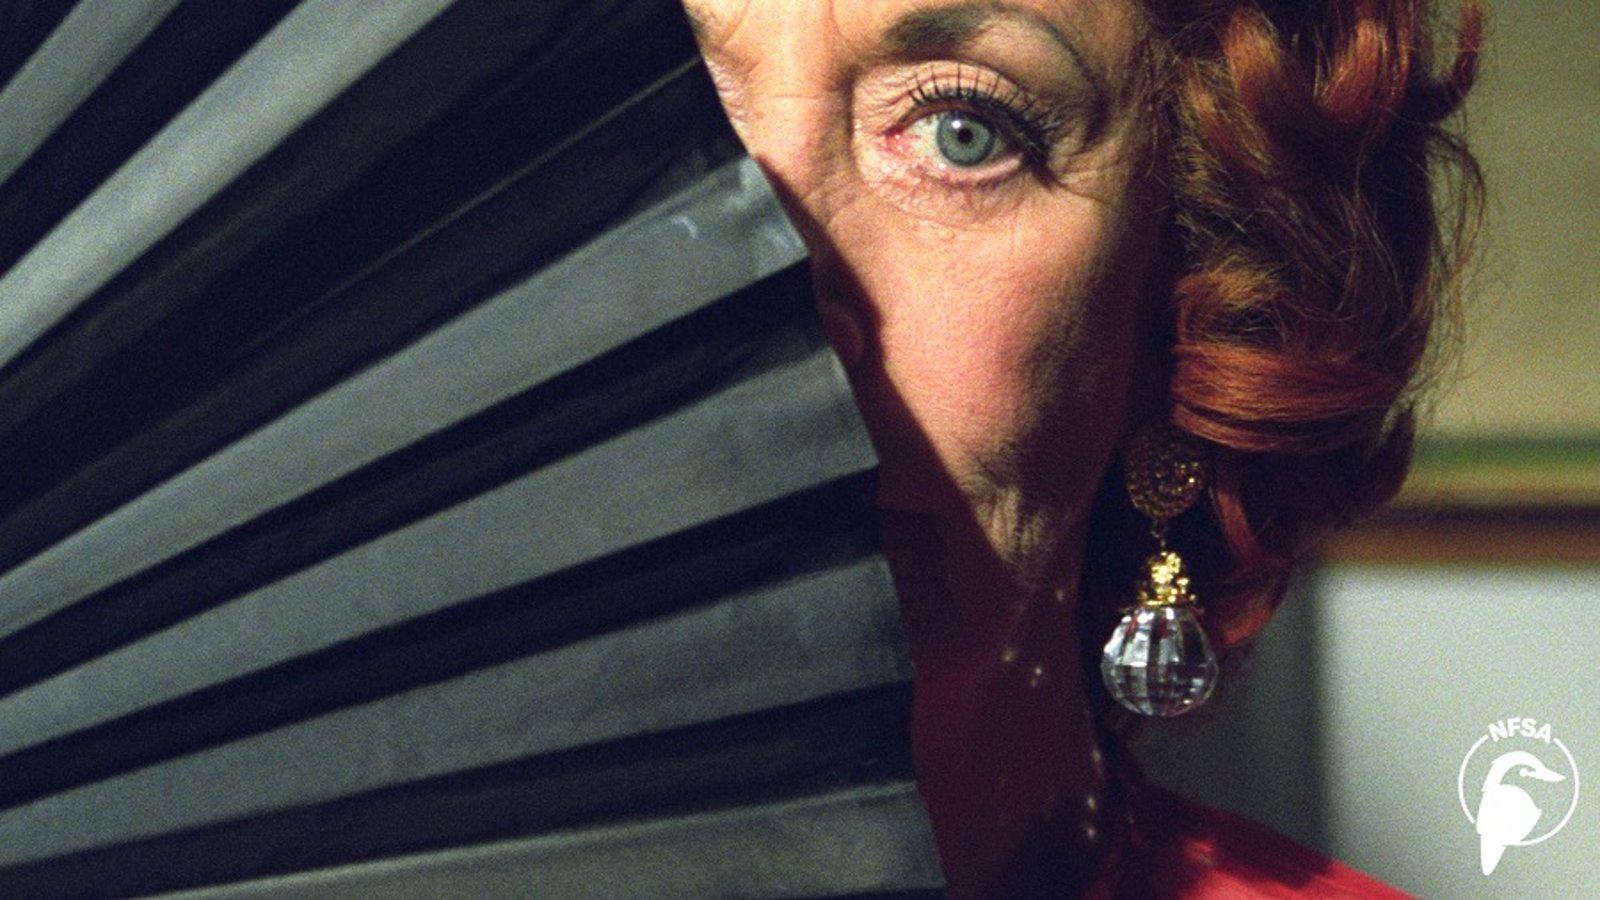 Unfolding Florence - The Many Lives of Florence Broadhurst